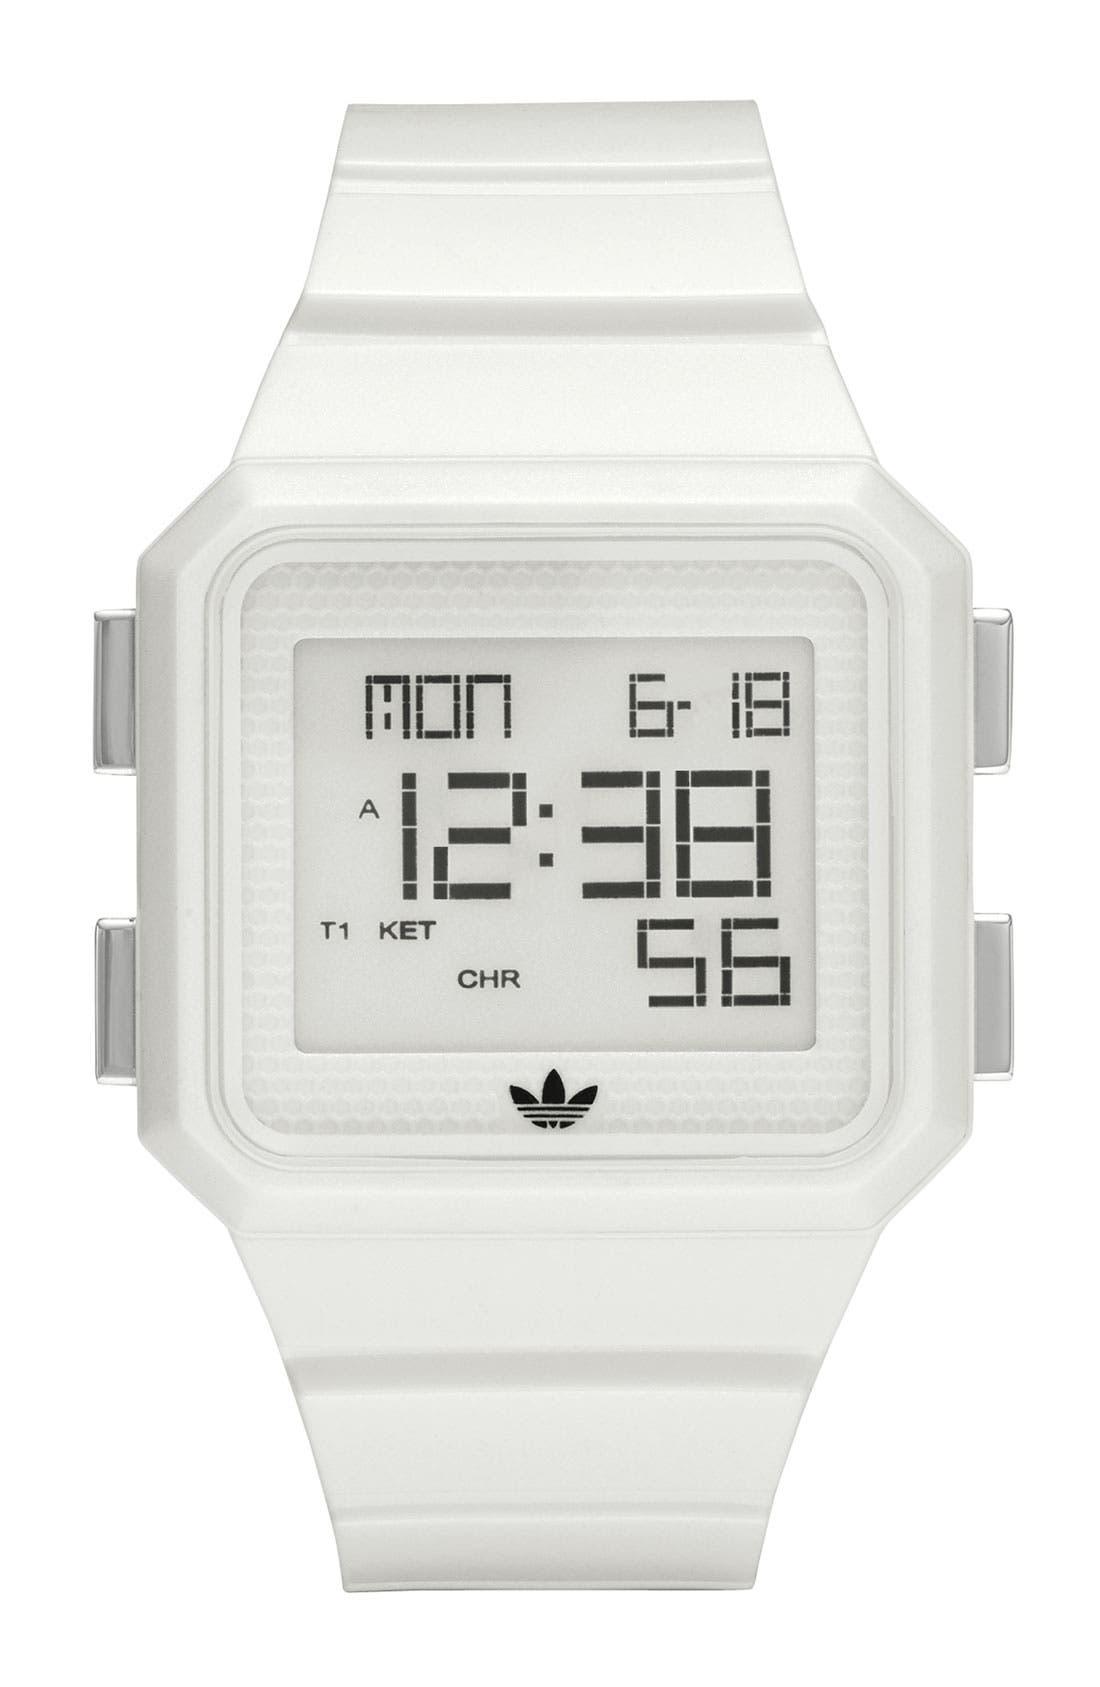 Main Image - adidas Originals 'Peachtree' Digital Watch, 46mm x 39mm